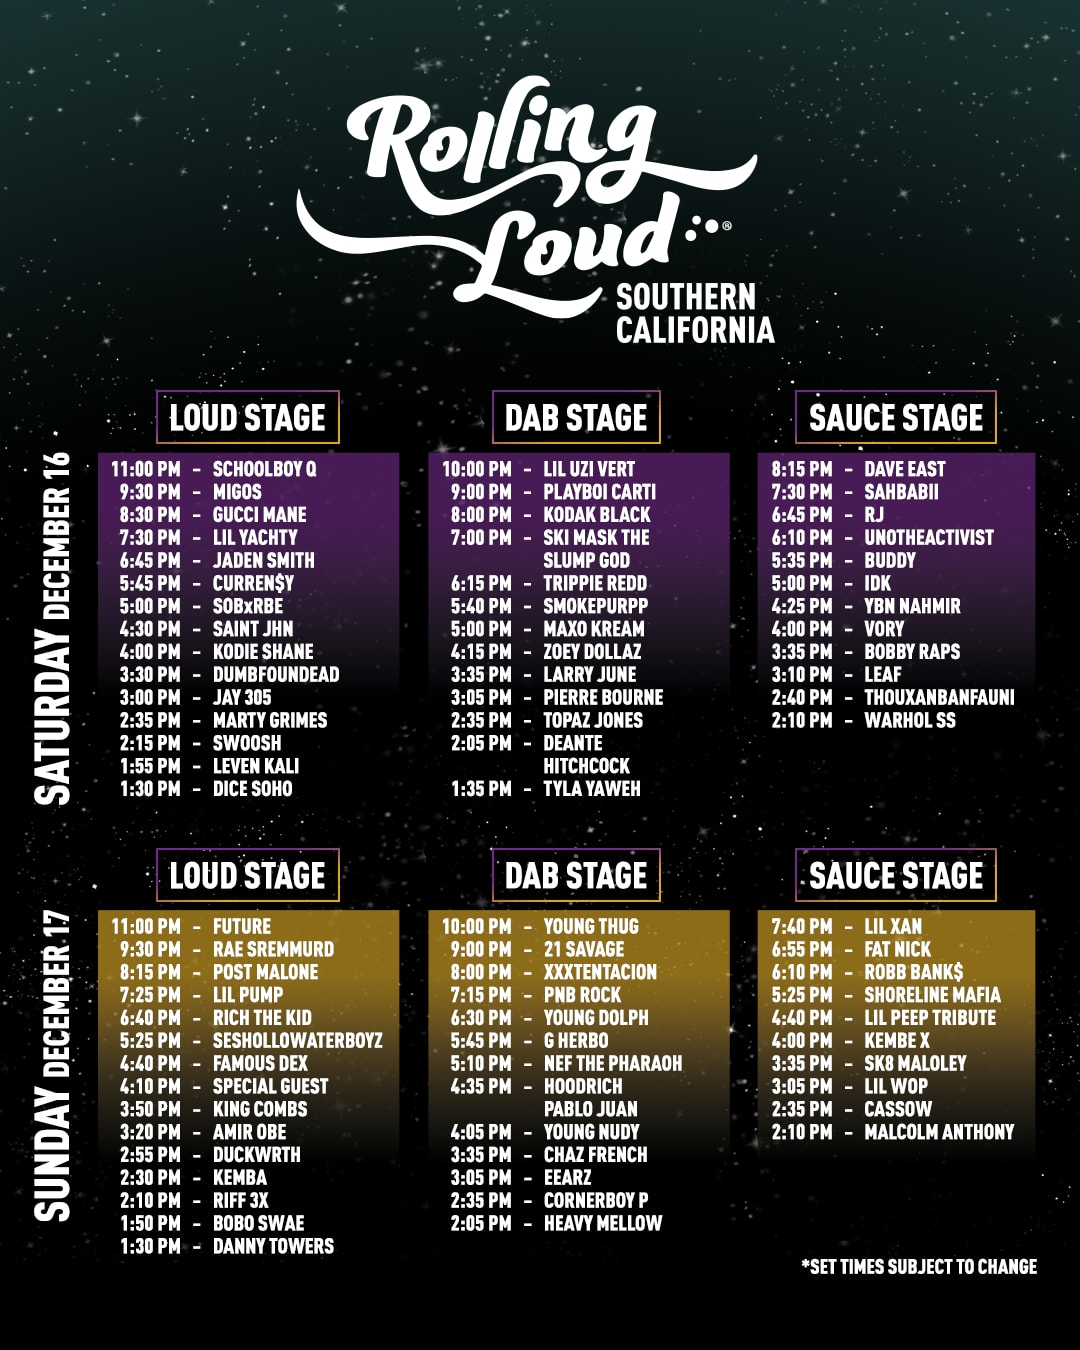 rolling_loud-set-times